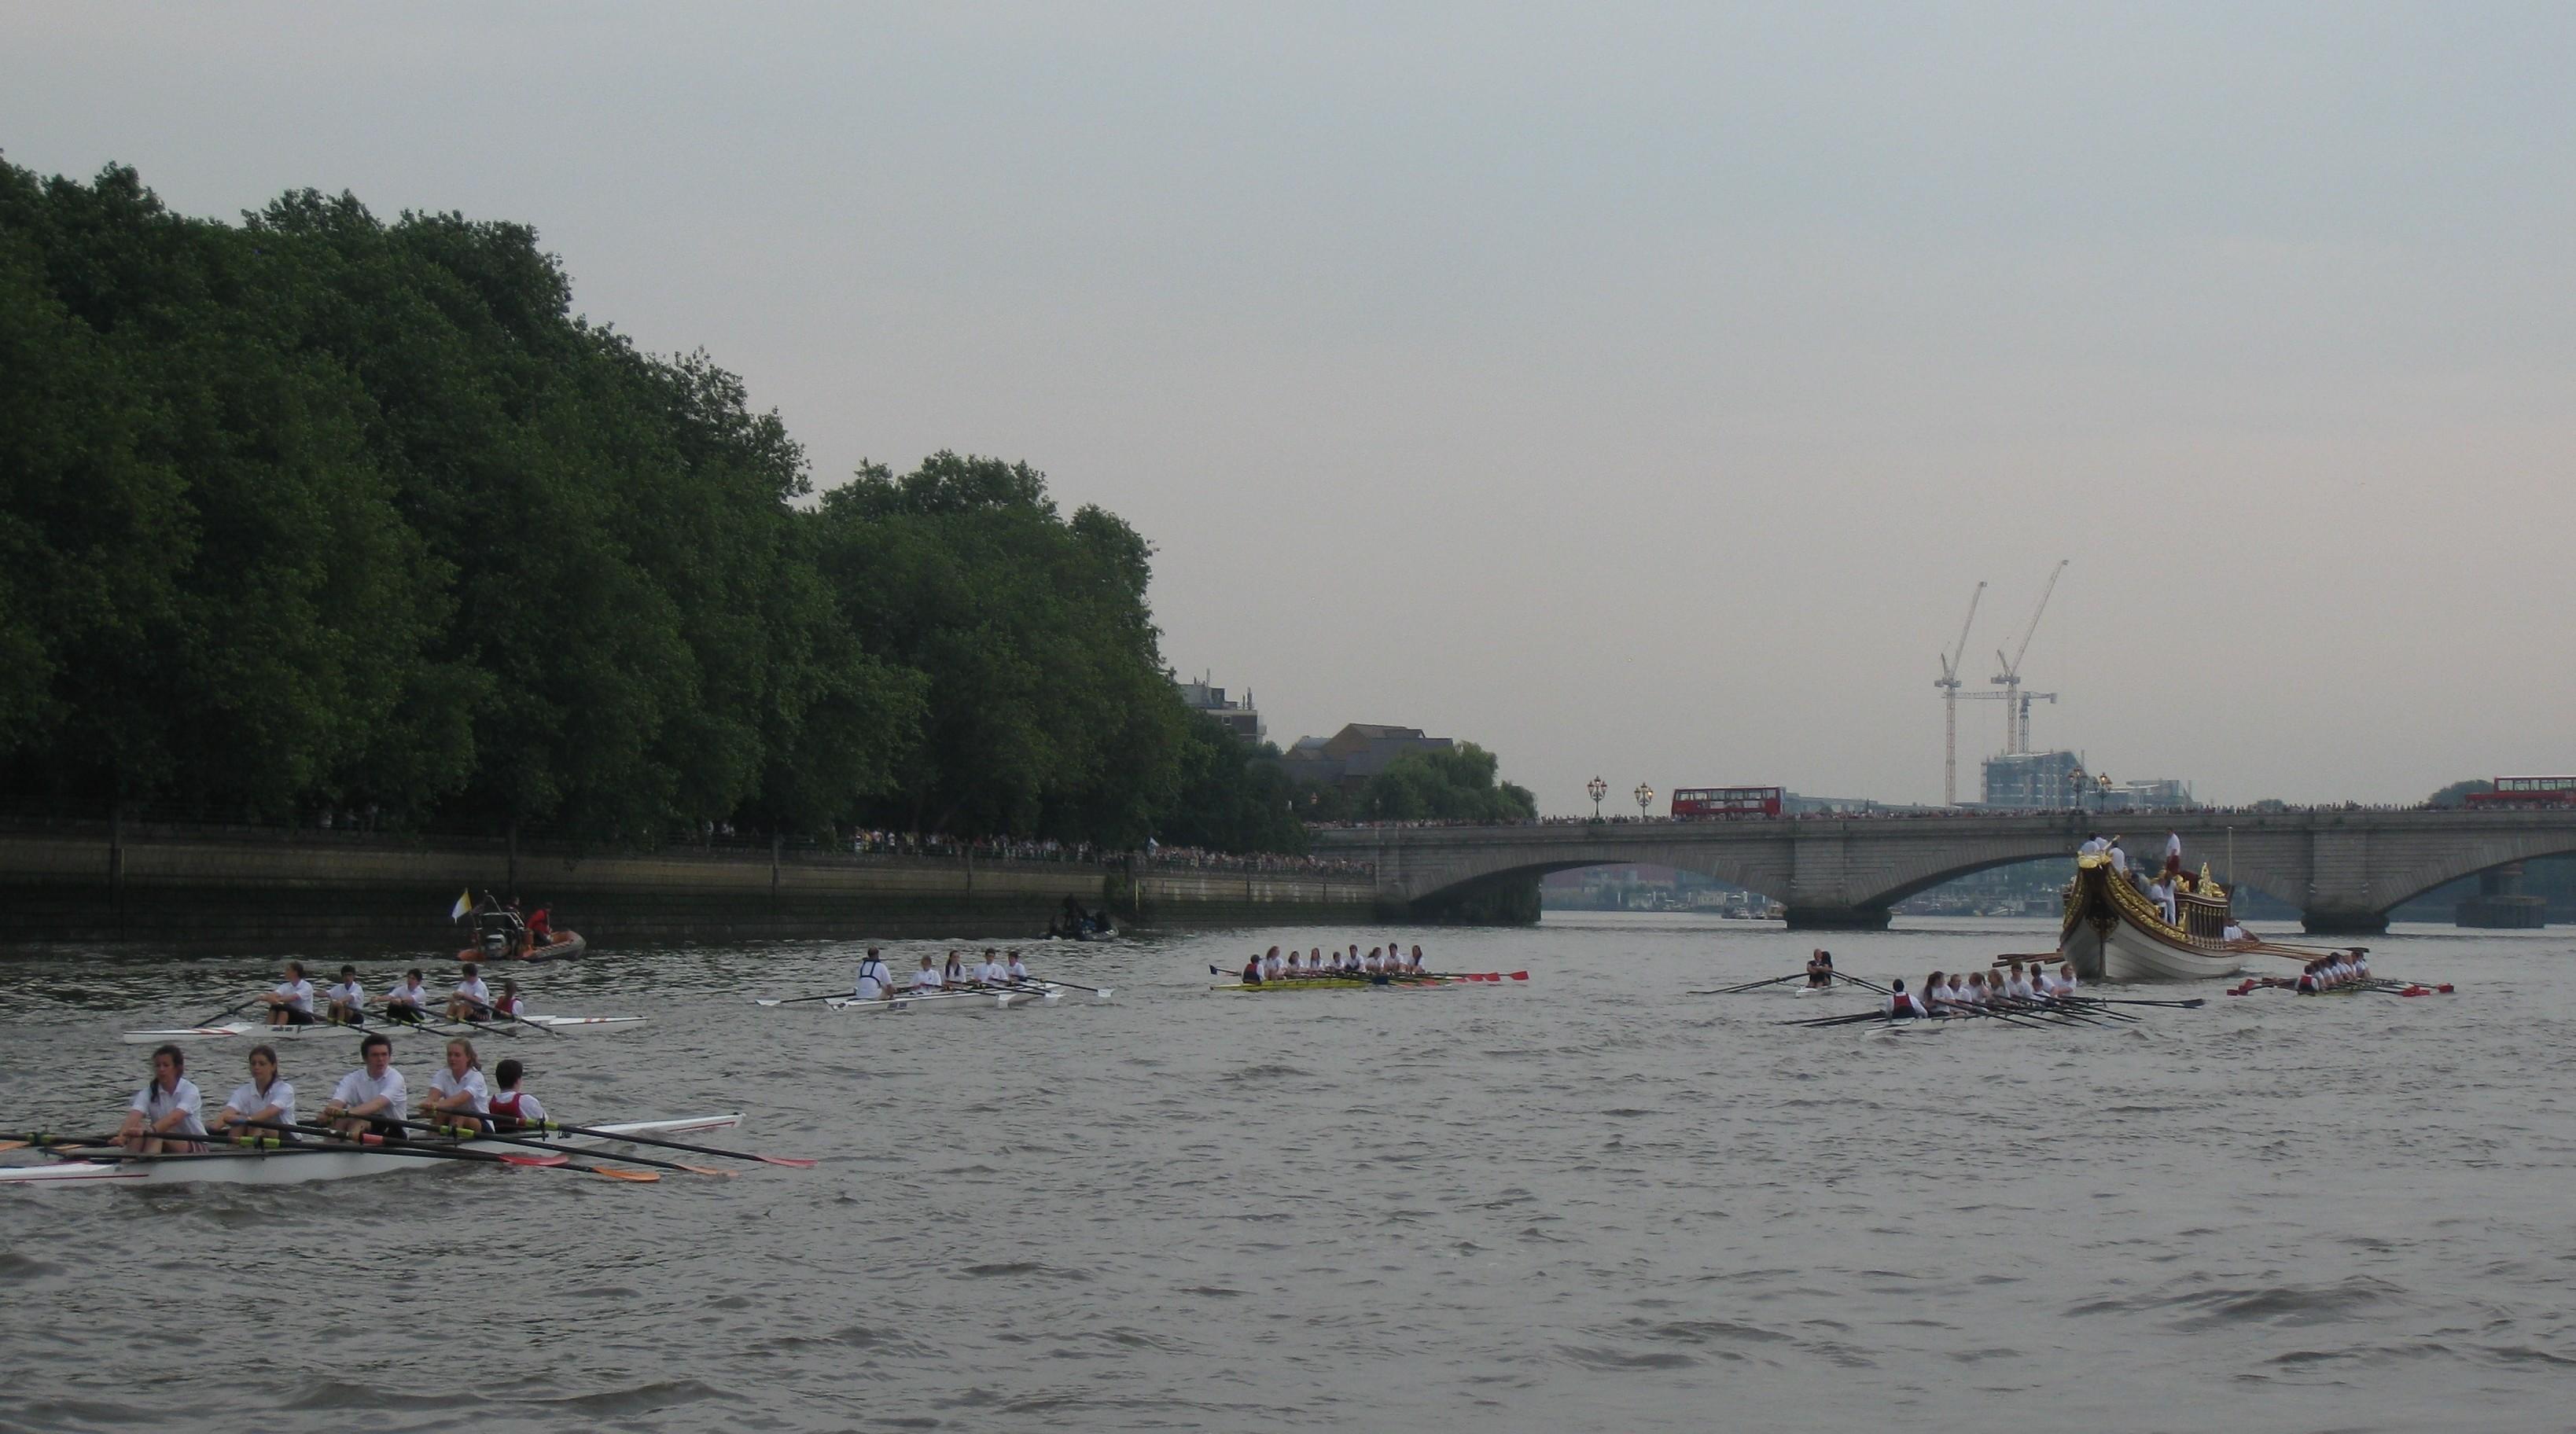 Flotilla 2 LYR